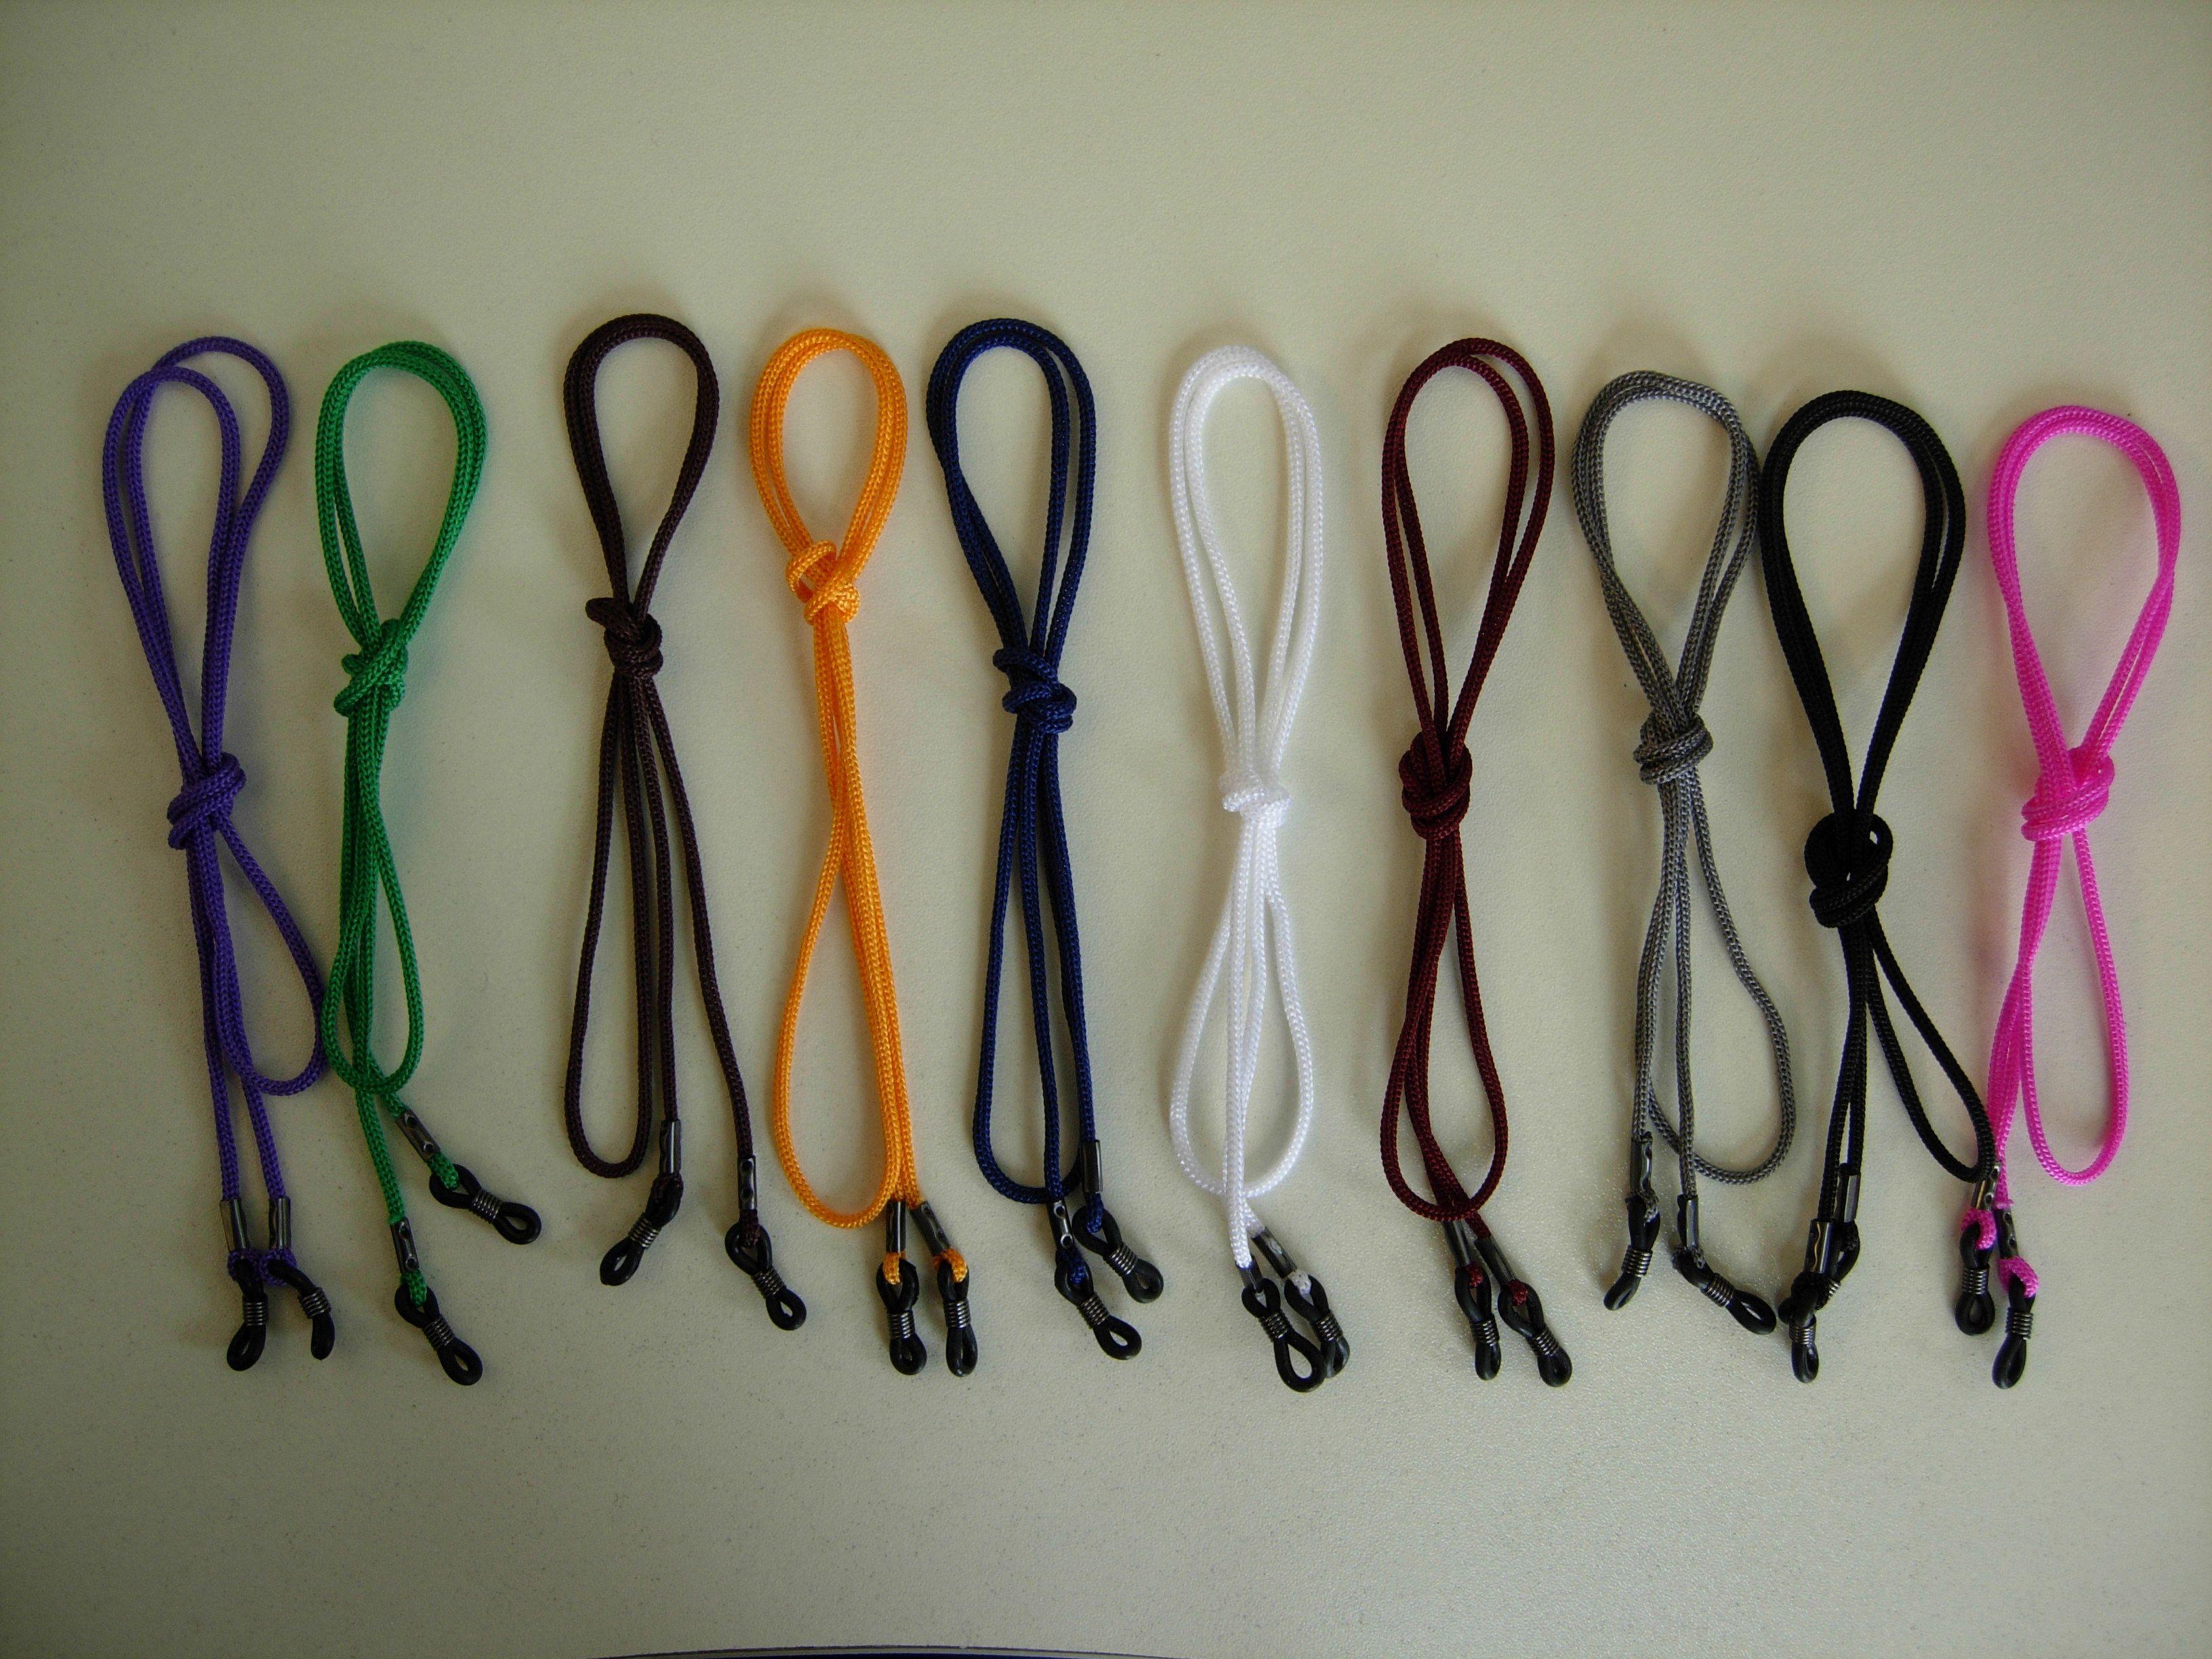 barato clássico nylon cordão corda cordão óculos corda retificador de óculos titular cordões cordões com durável silicone borrachas